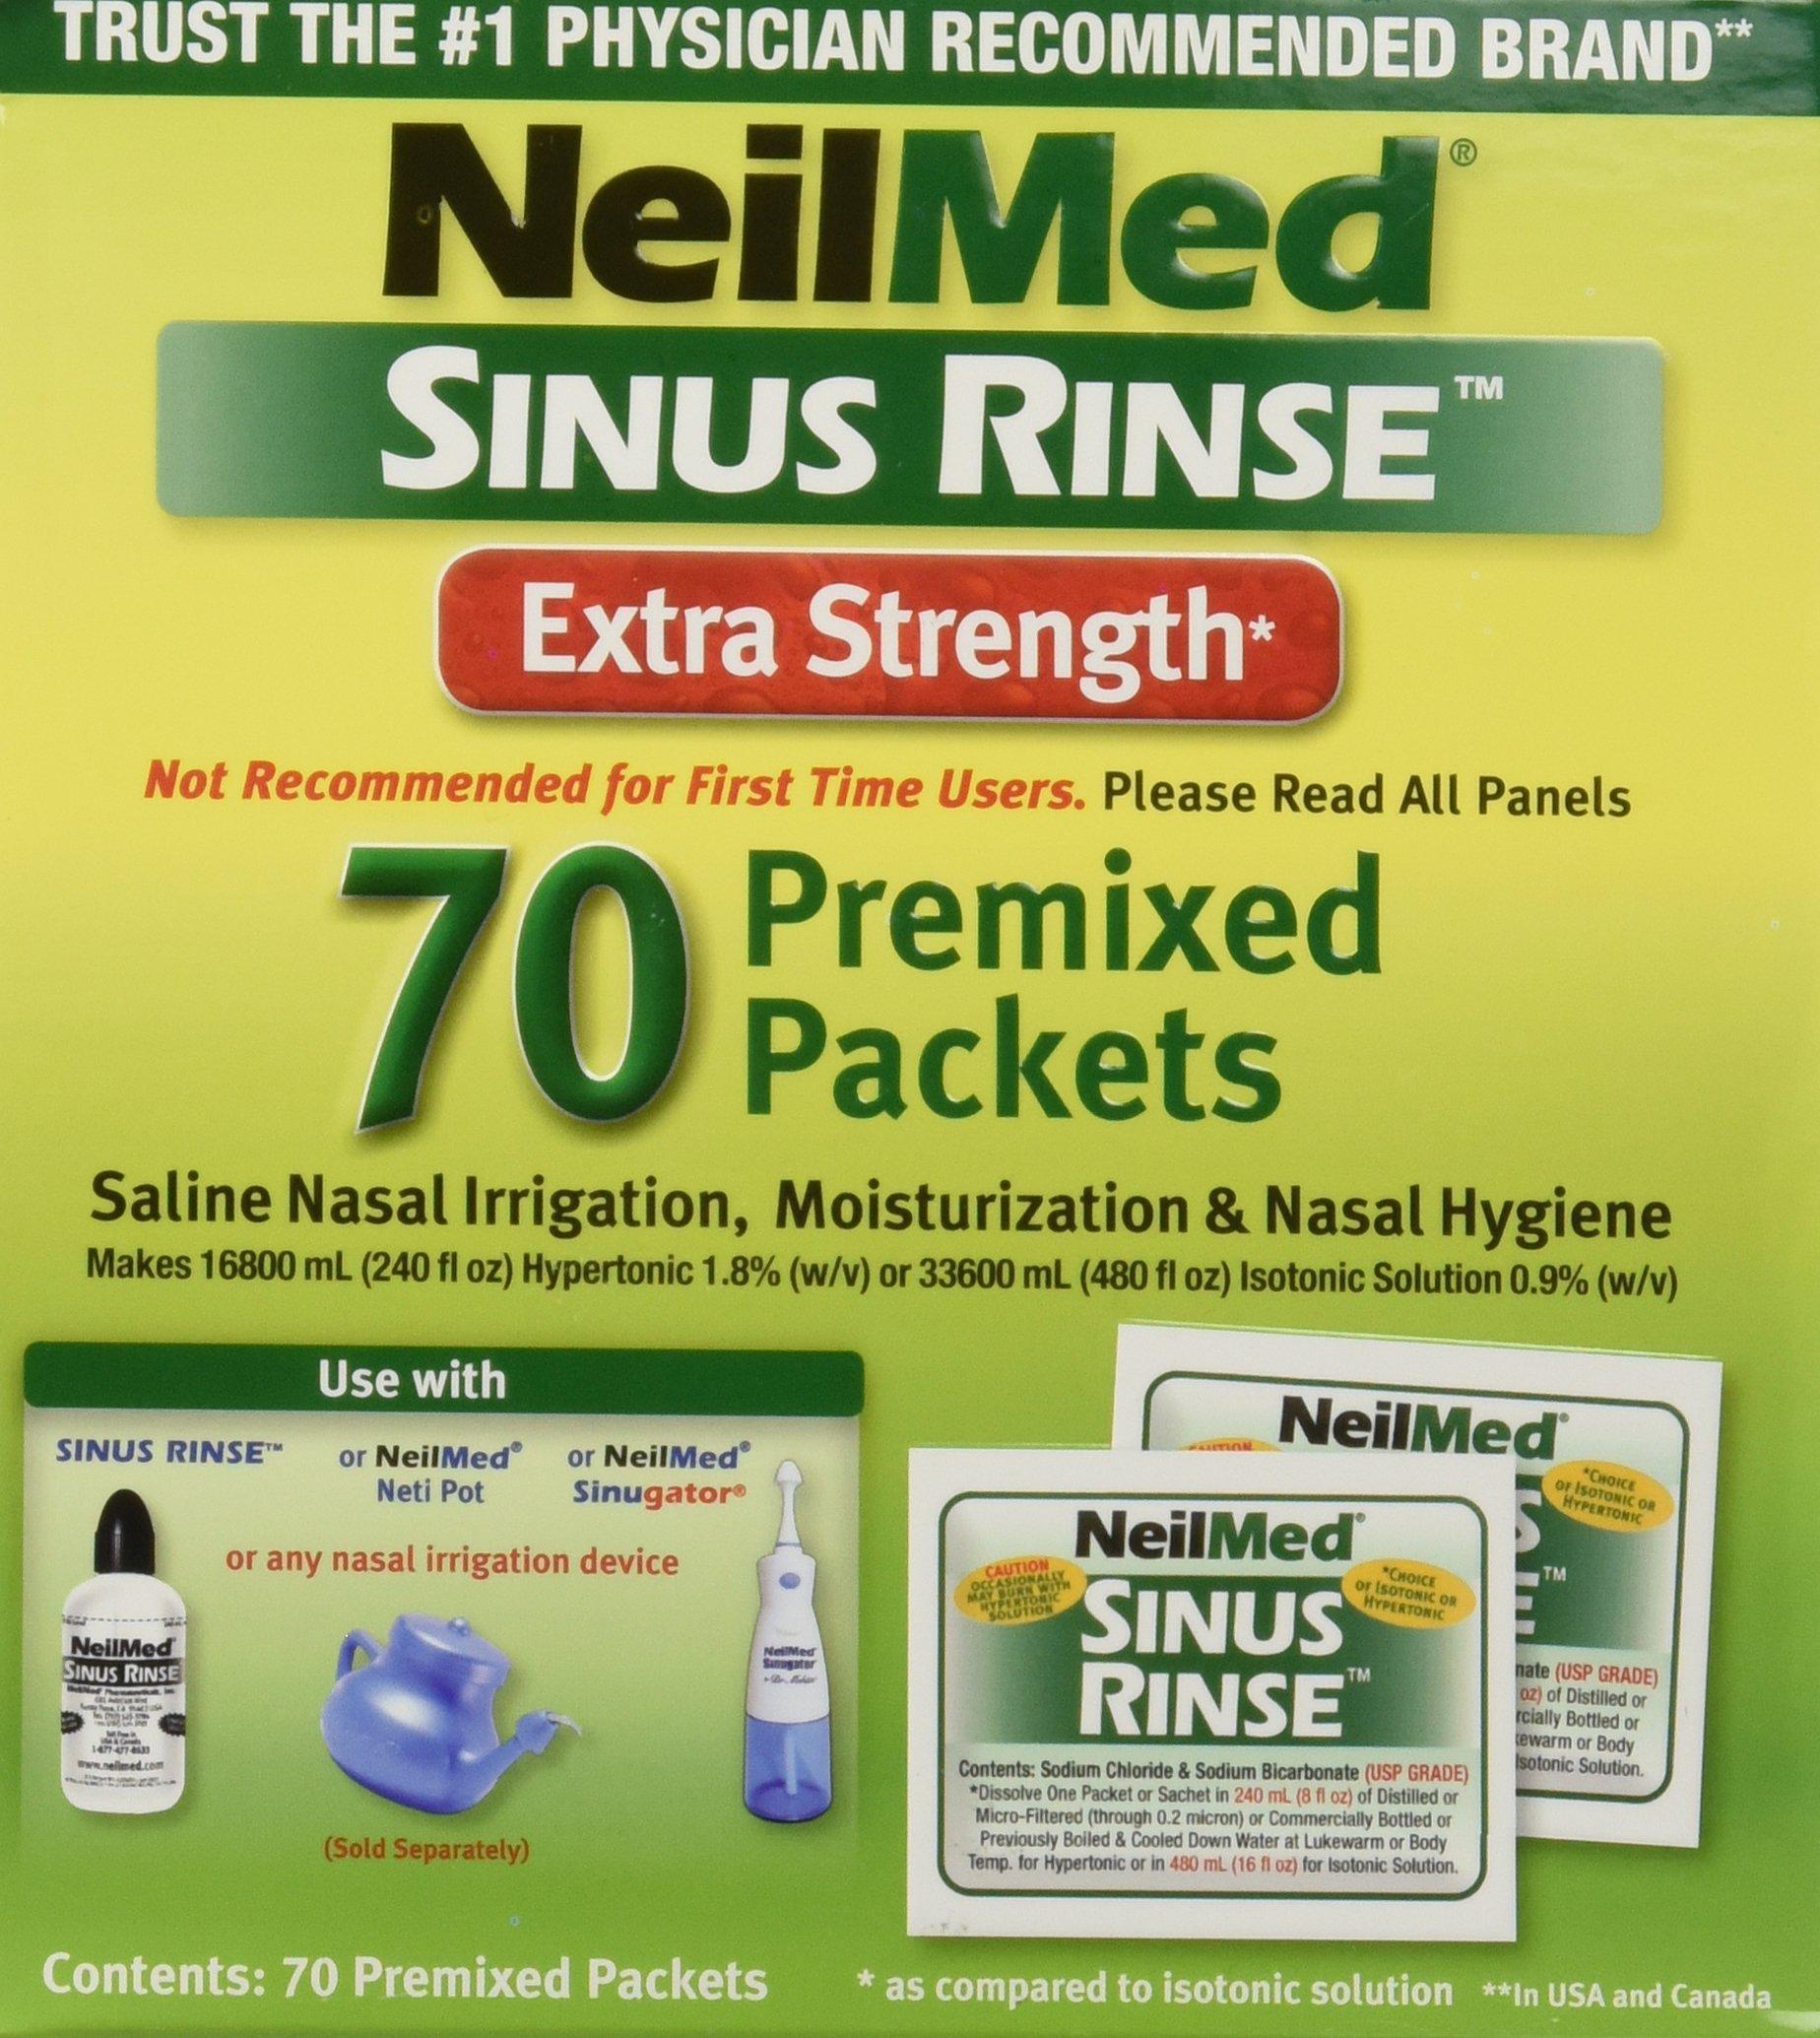 NeilMed Sinus Rinse Extra Strength Hypertonic 70 Packets